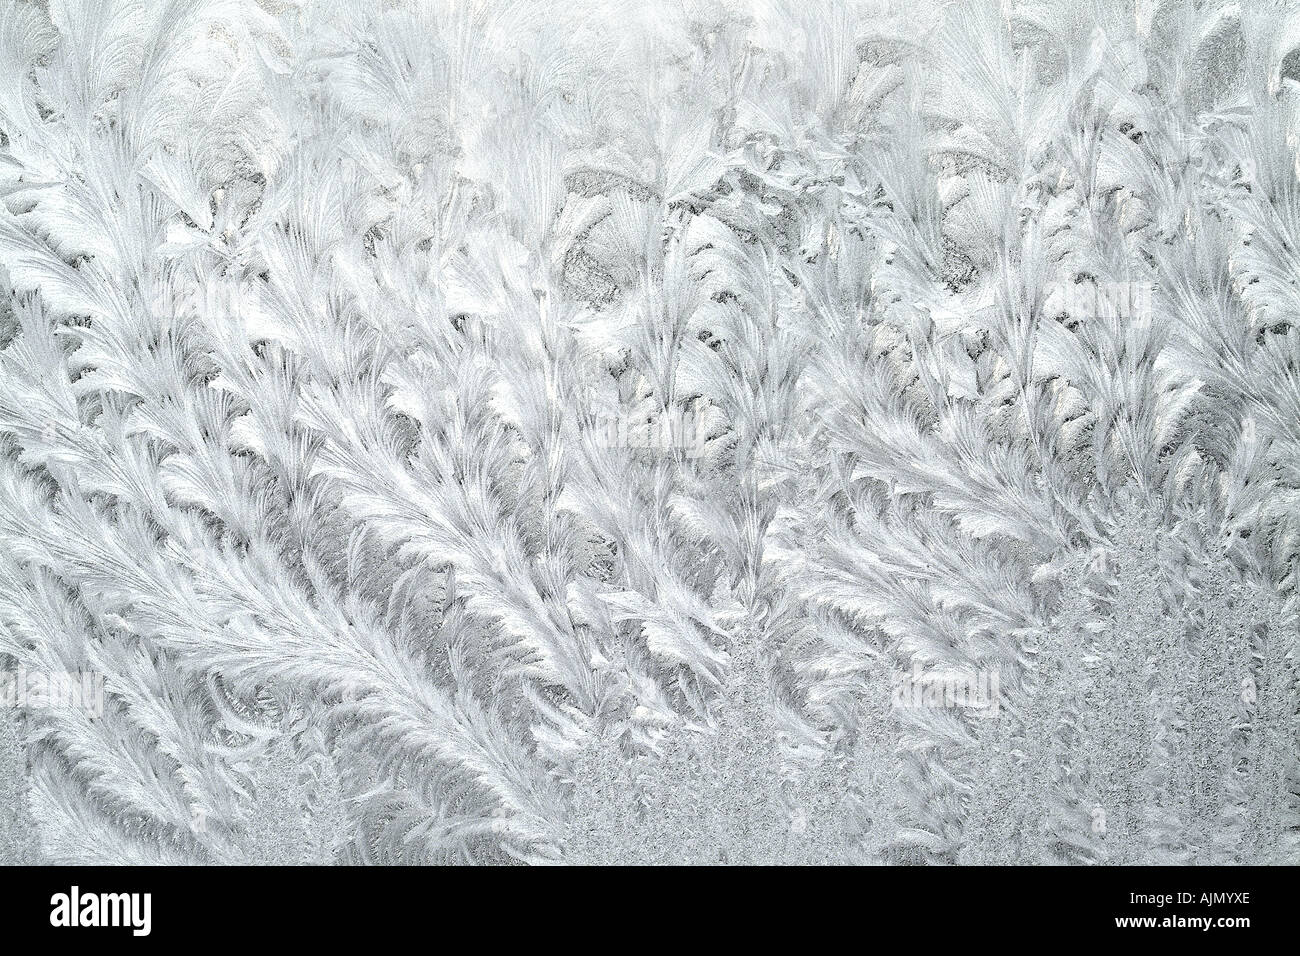 Frost Pattern Detail On Window - Stock Image